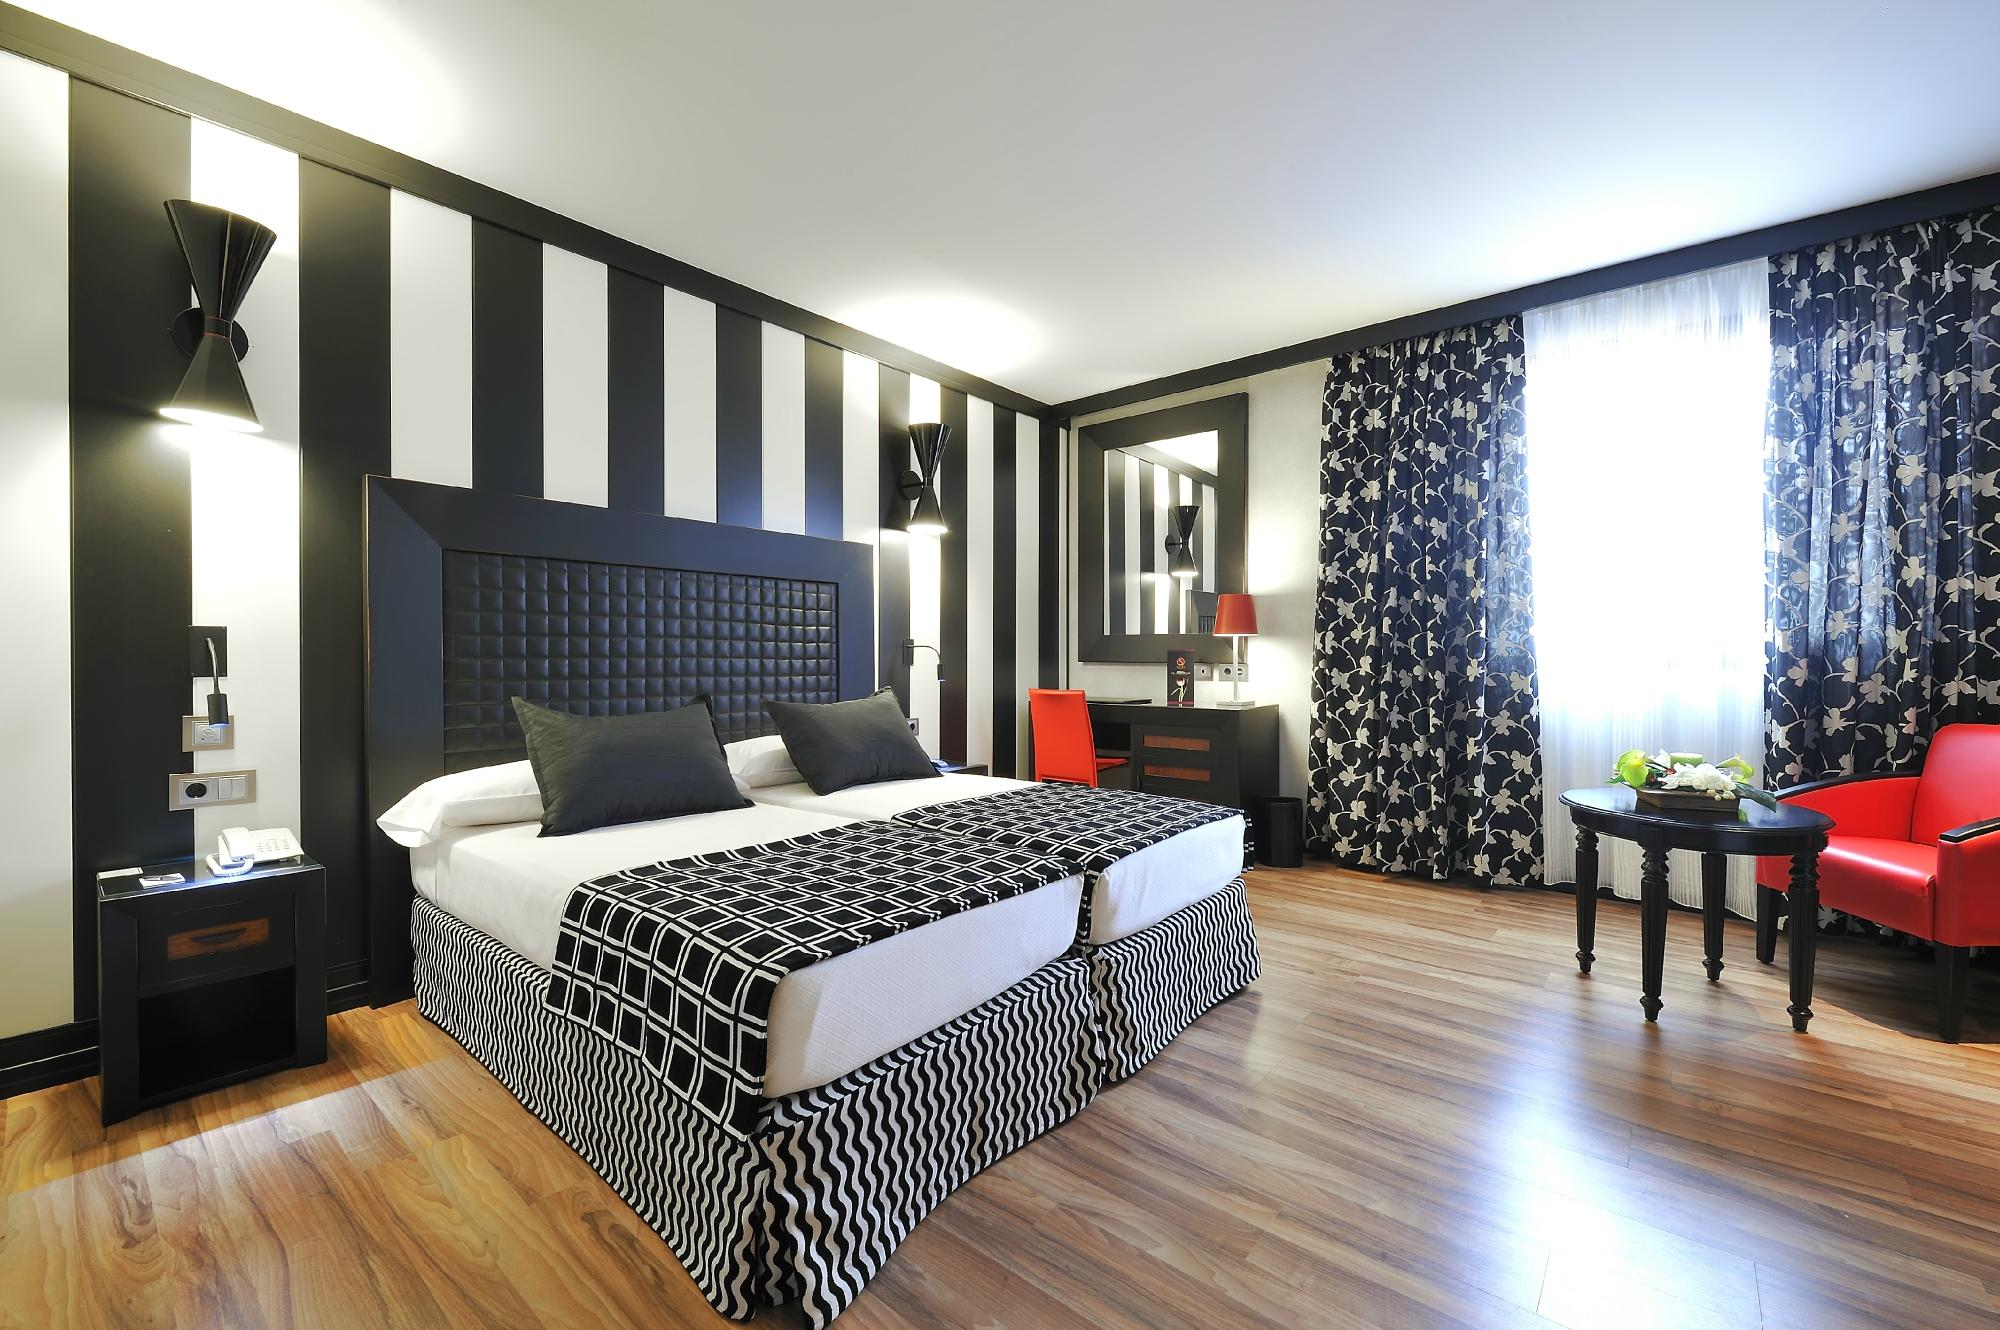 Salles Hotel Aeroport Girona